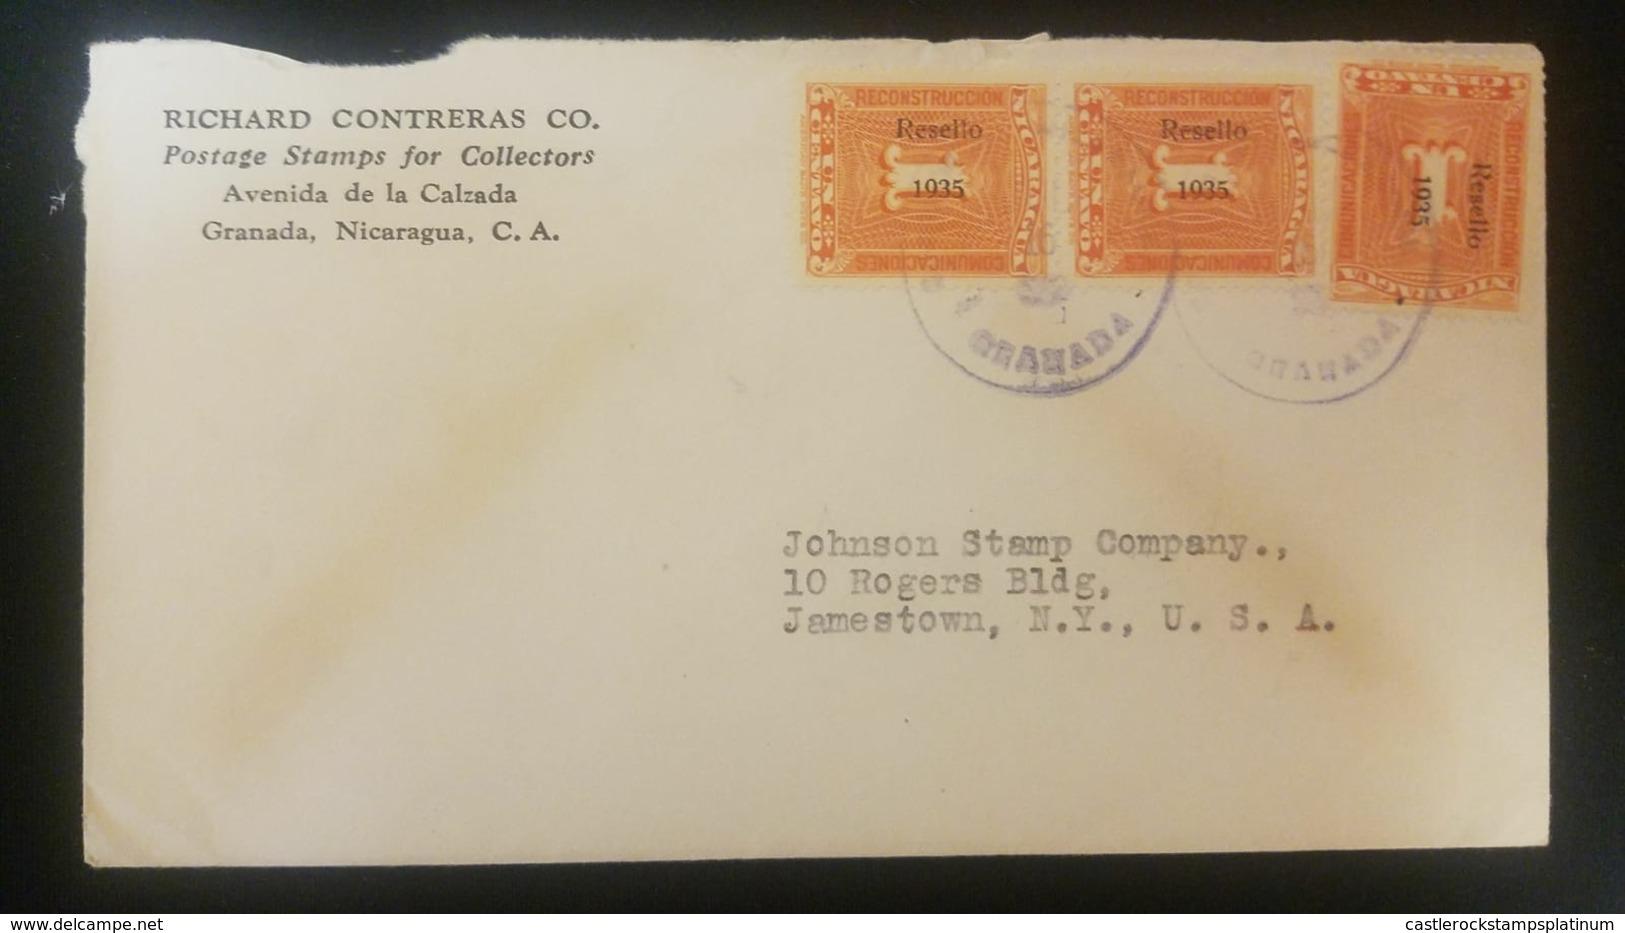 O) 1935 NICARAGUA,Ra-45, NUMERAL 1 -RESELLO - COMUNICACIONES -COMMUNICATIONS, OVERPRINTED, FROM GRANADA TO USA - Nicaragua